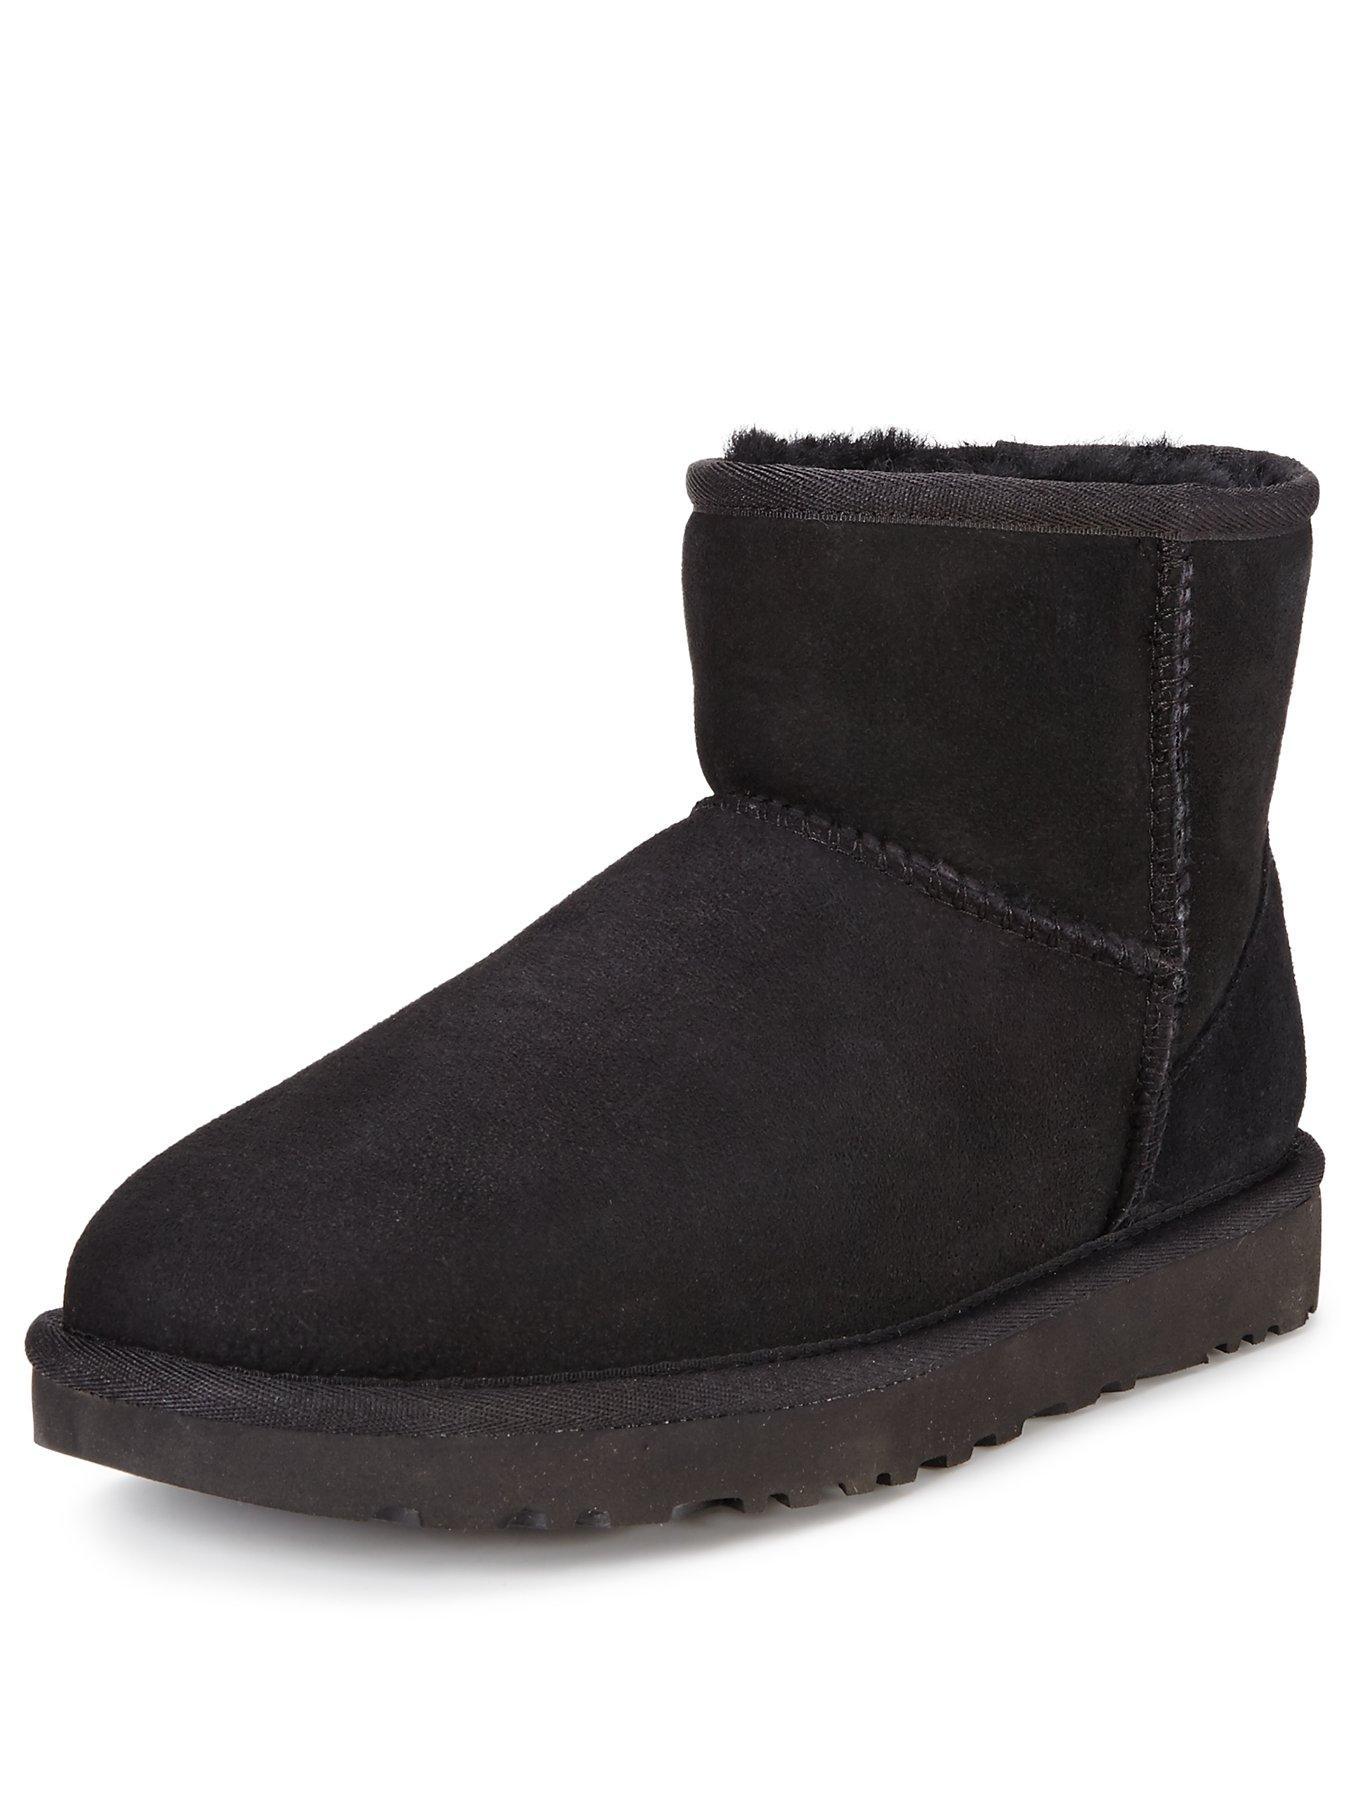 UGG Boots, Shoes \u0026 Slippers